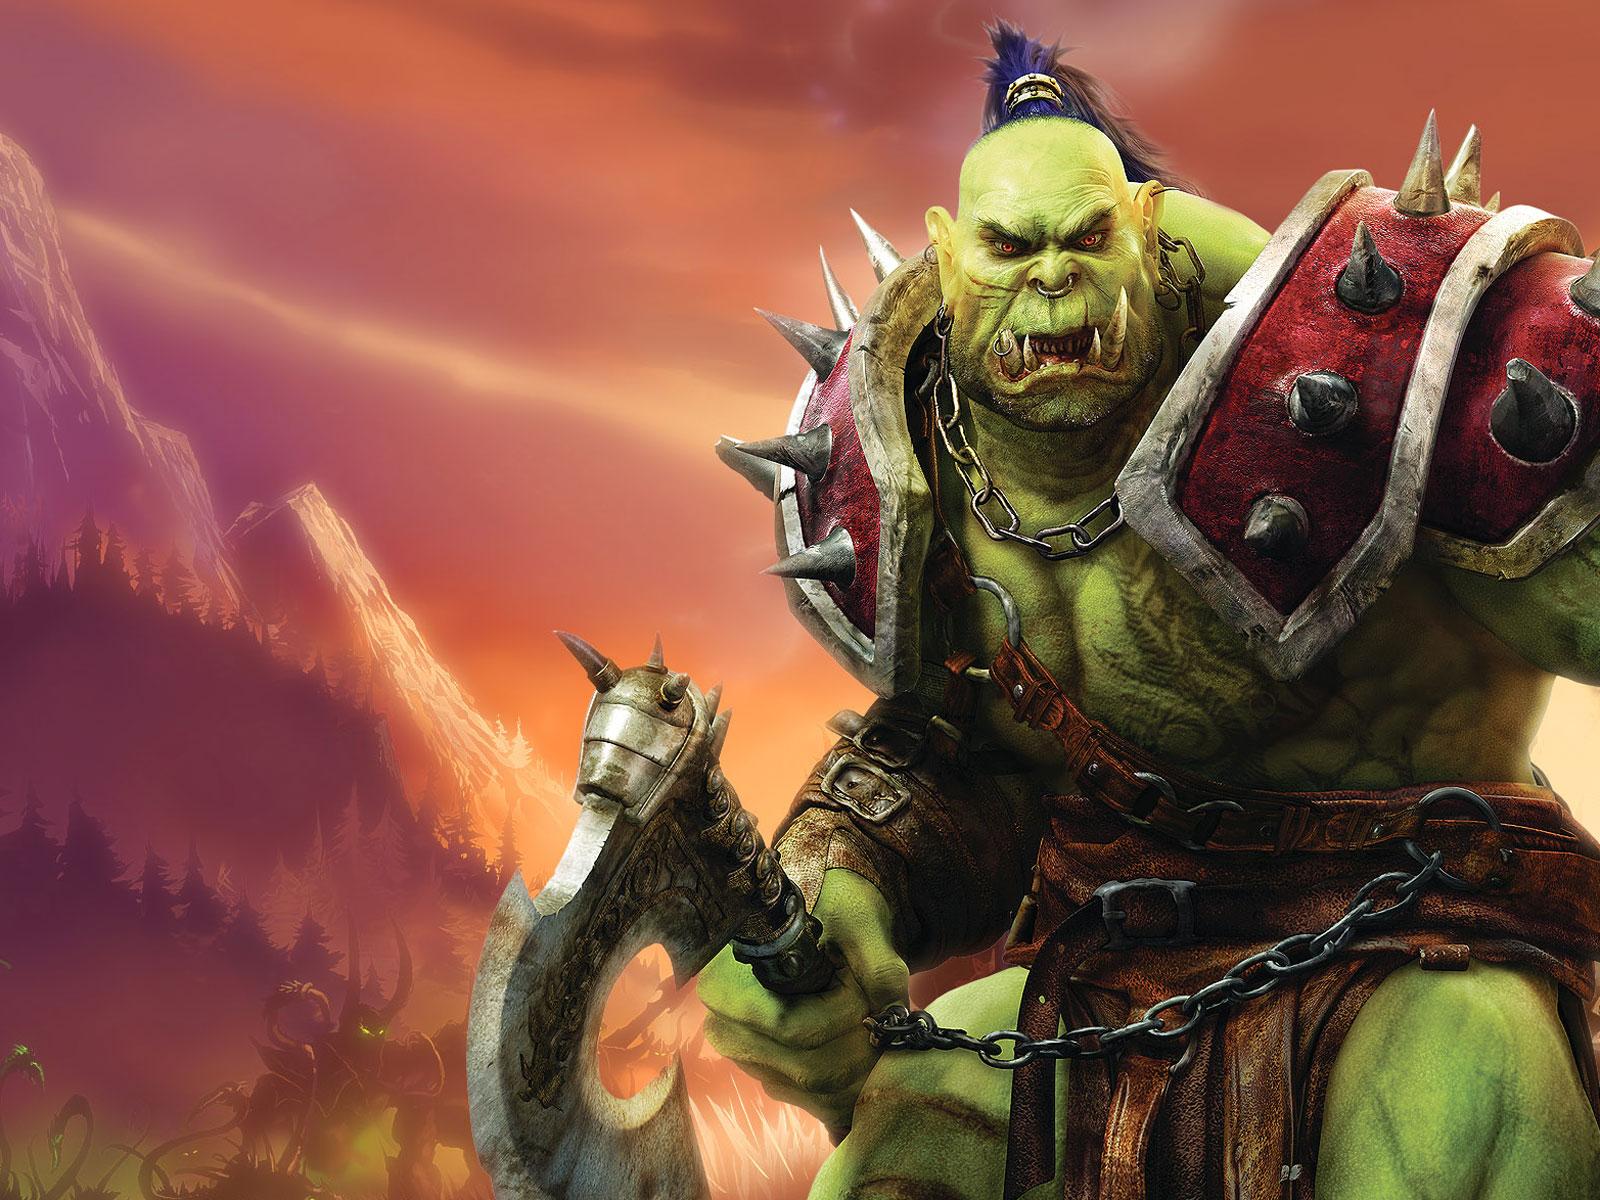 World of Warcraft sotto attacco DDoS, Blizzard chiude i server